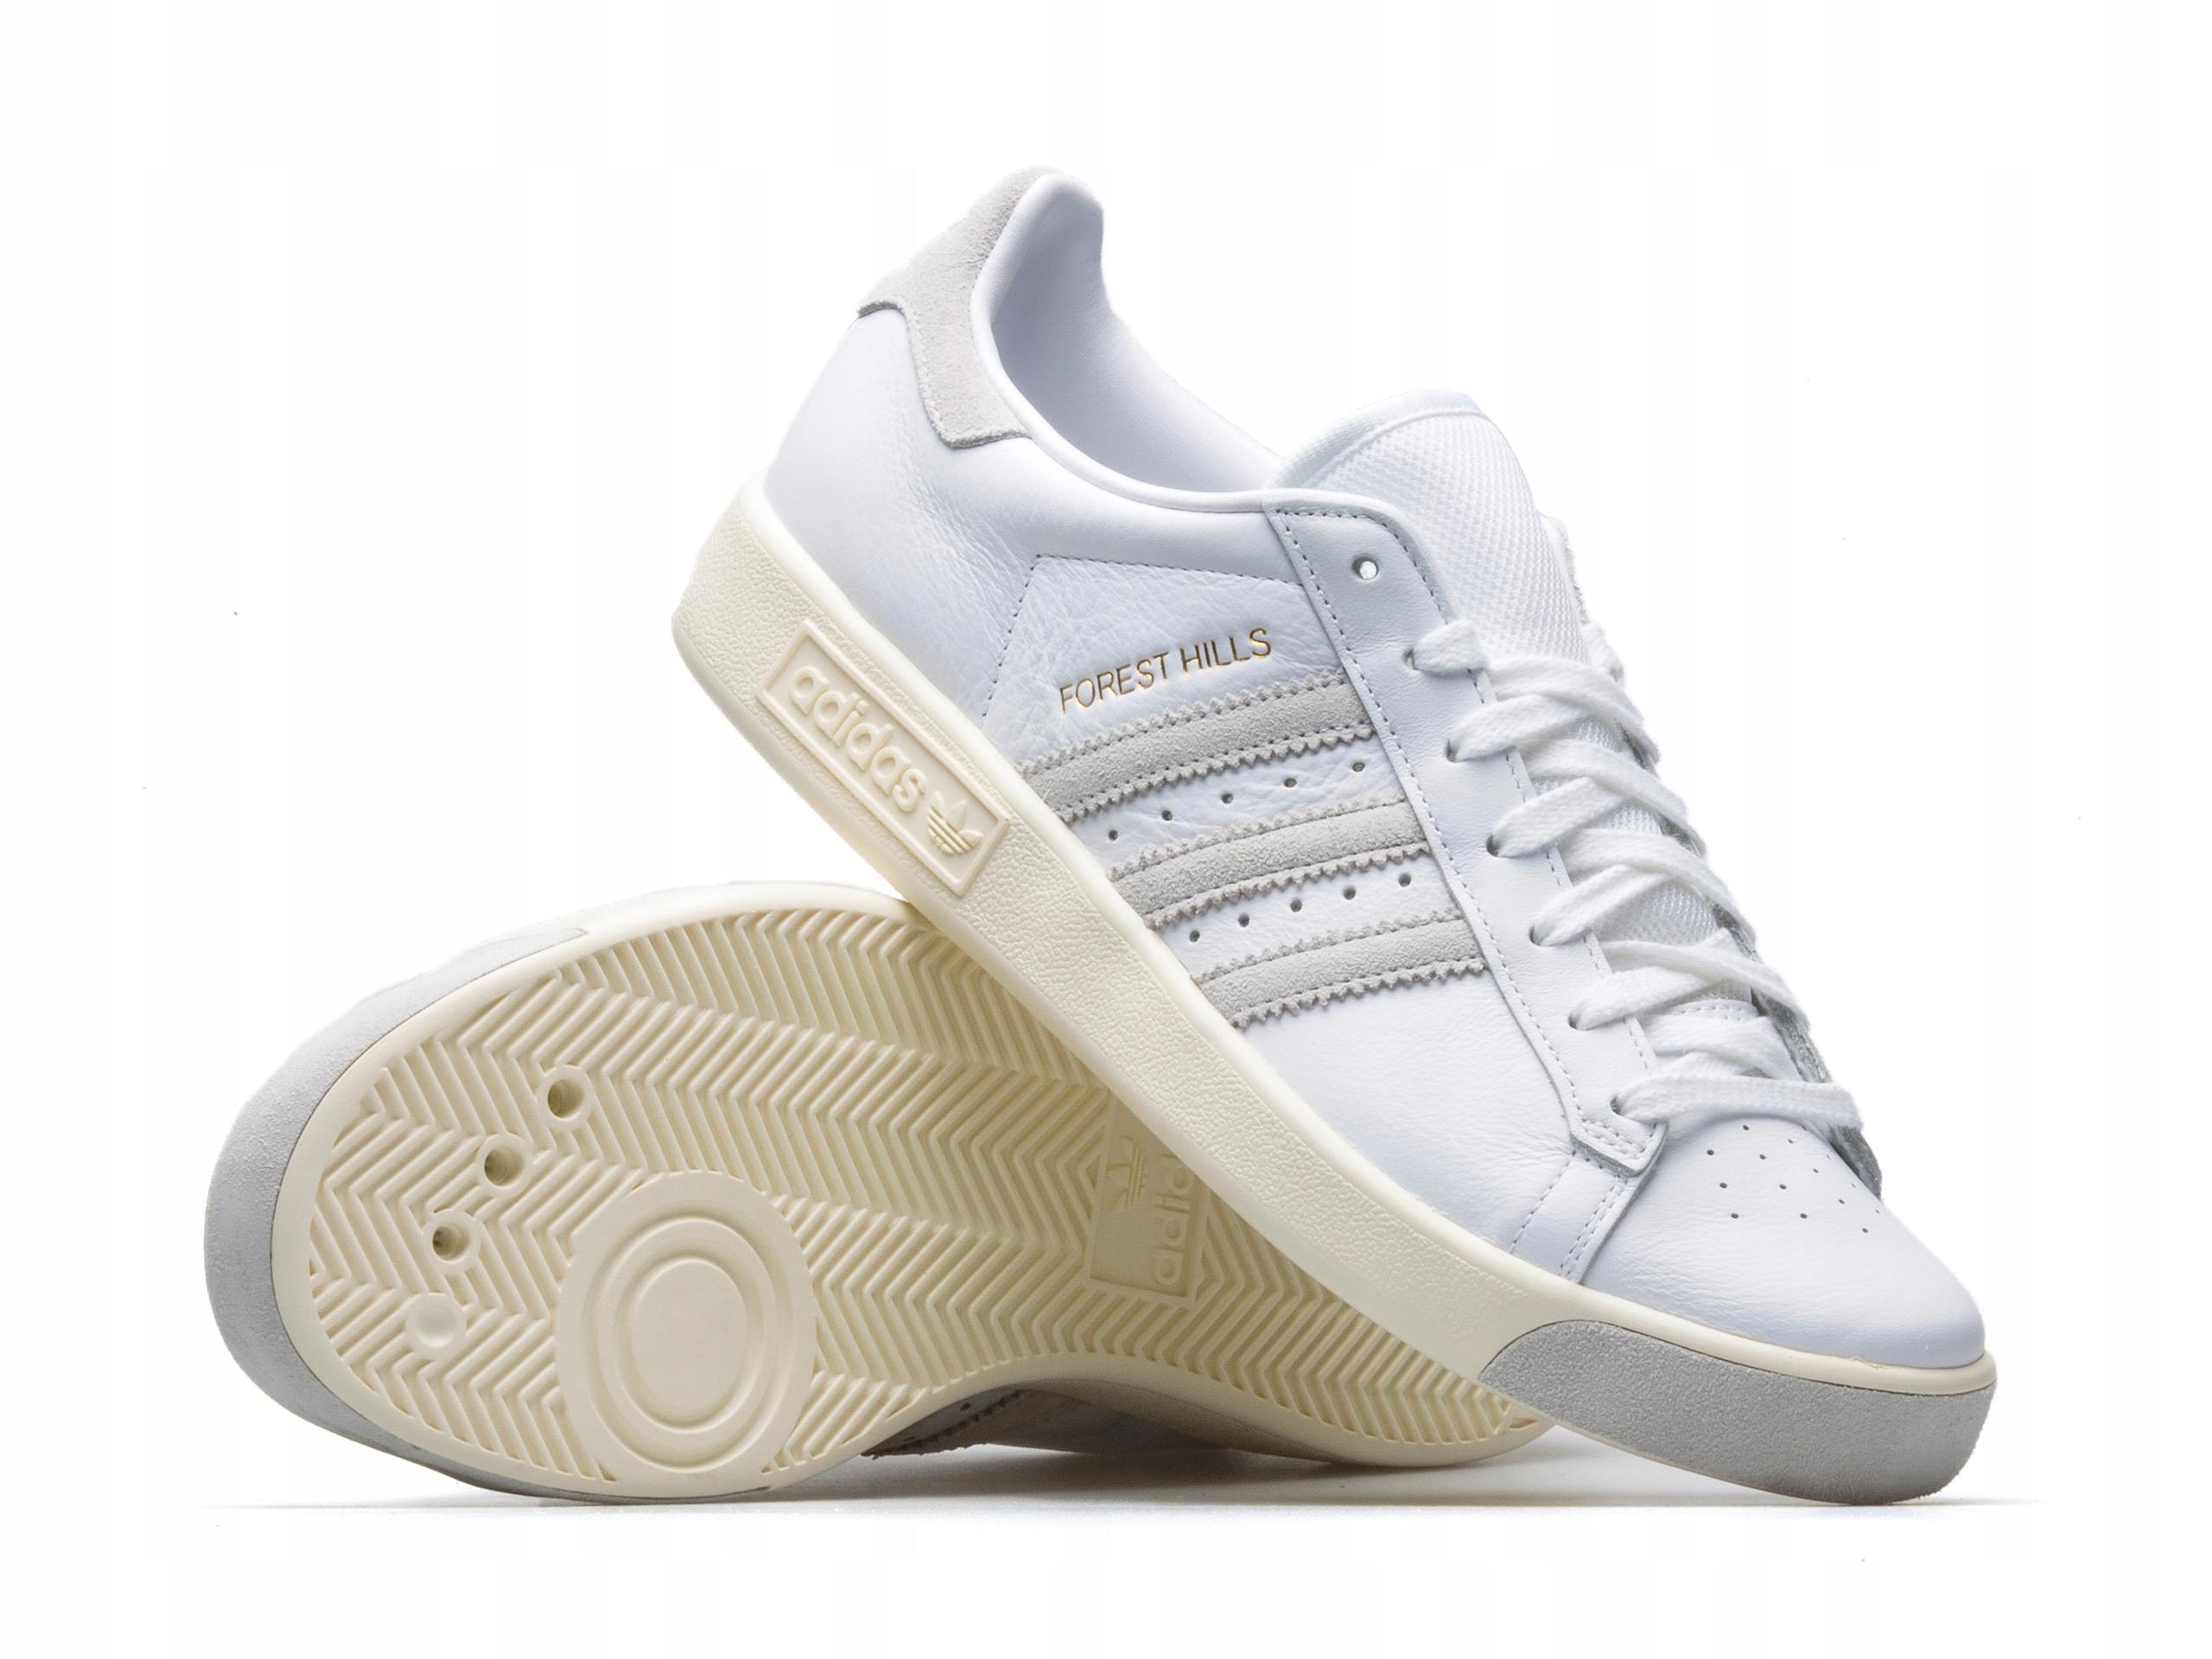 on sale cd53a 6e49c Buty męskie adidas FOREST HILLS D96779 r. 44 23